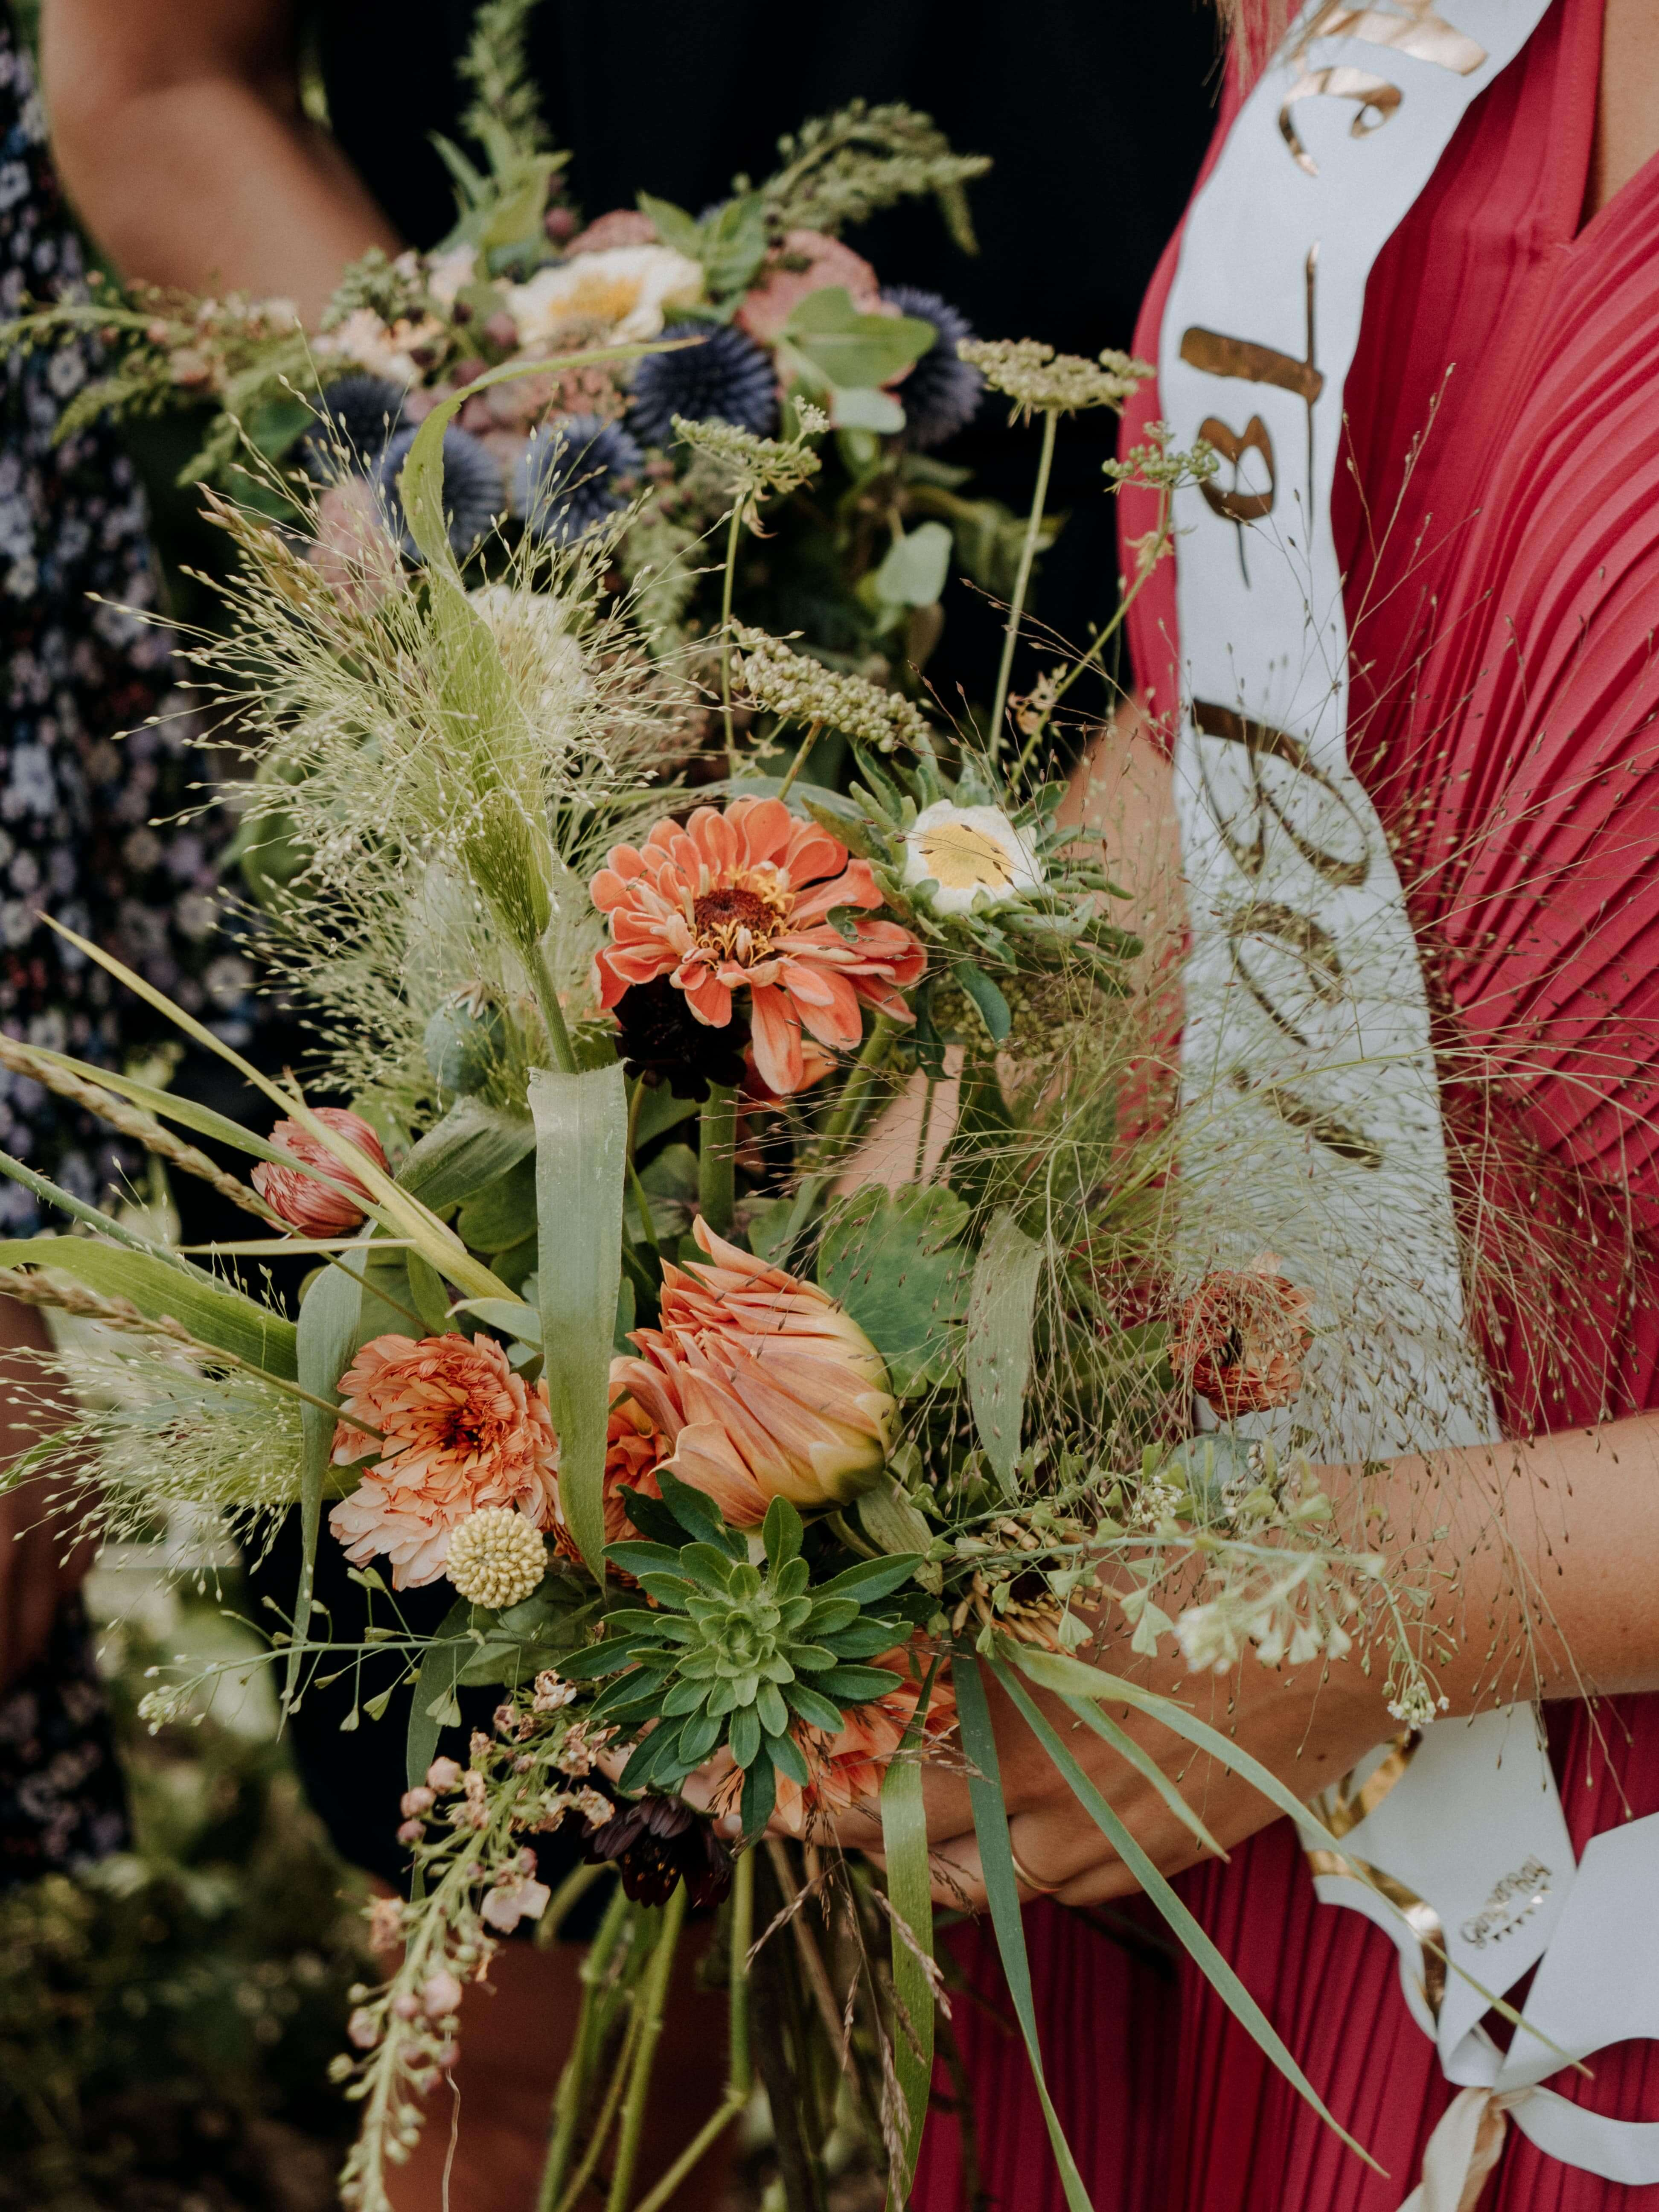 Möhippa i blomsterbäddar